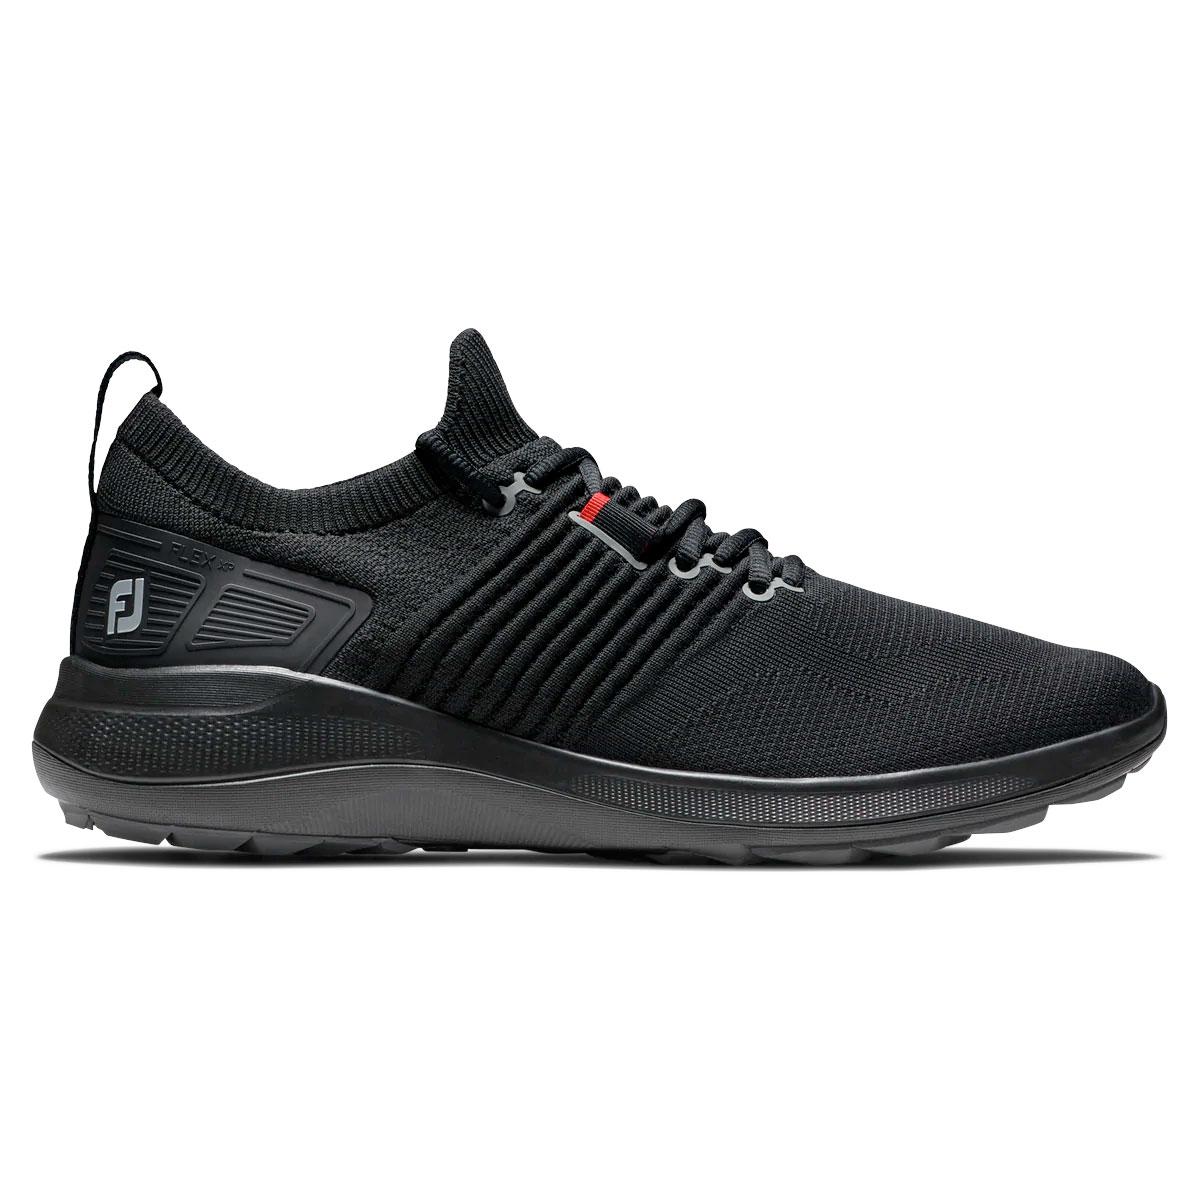 FootJoy Flex XP Mens Spikeless Golf Shoes  - Black